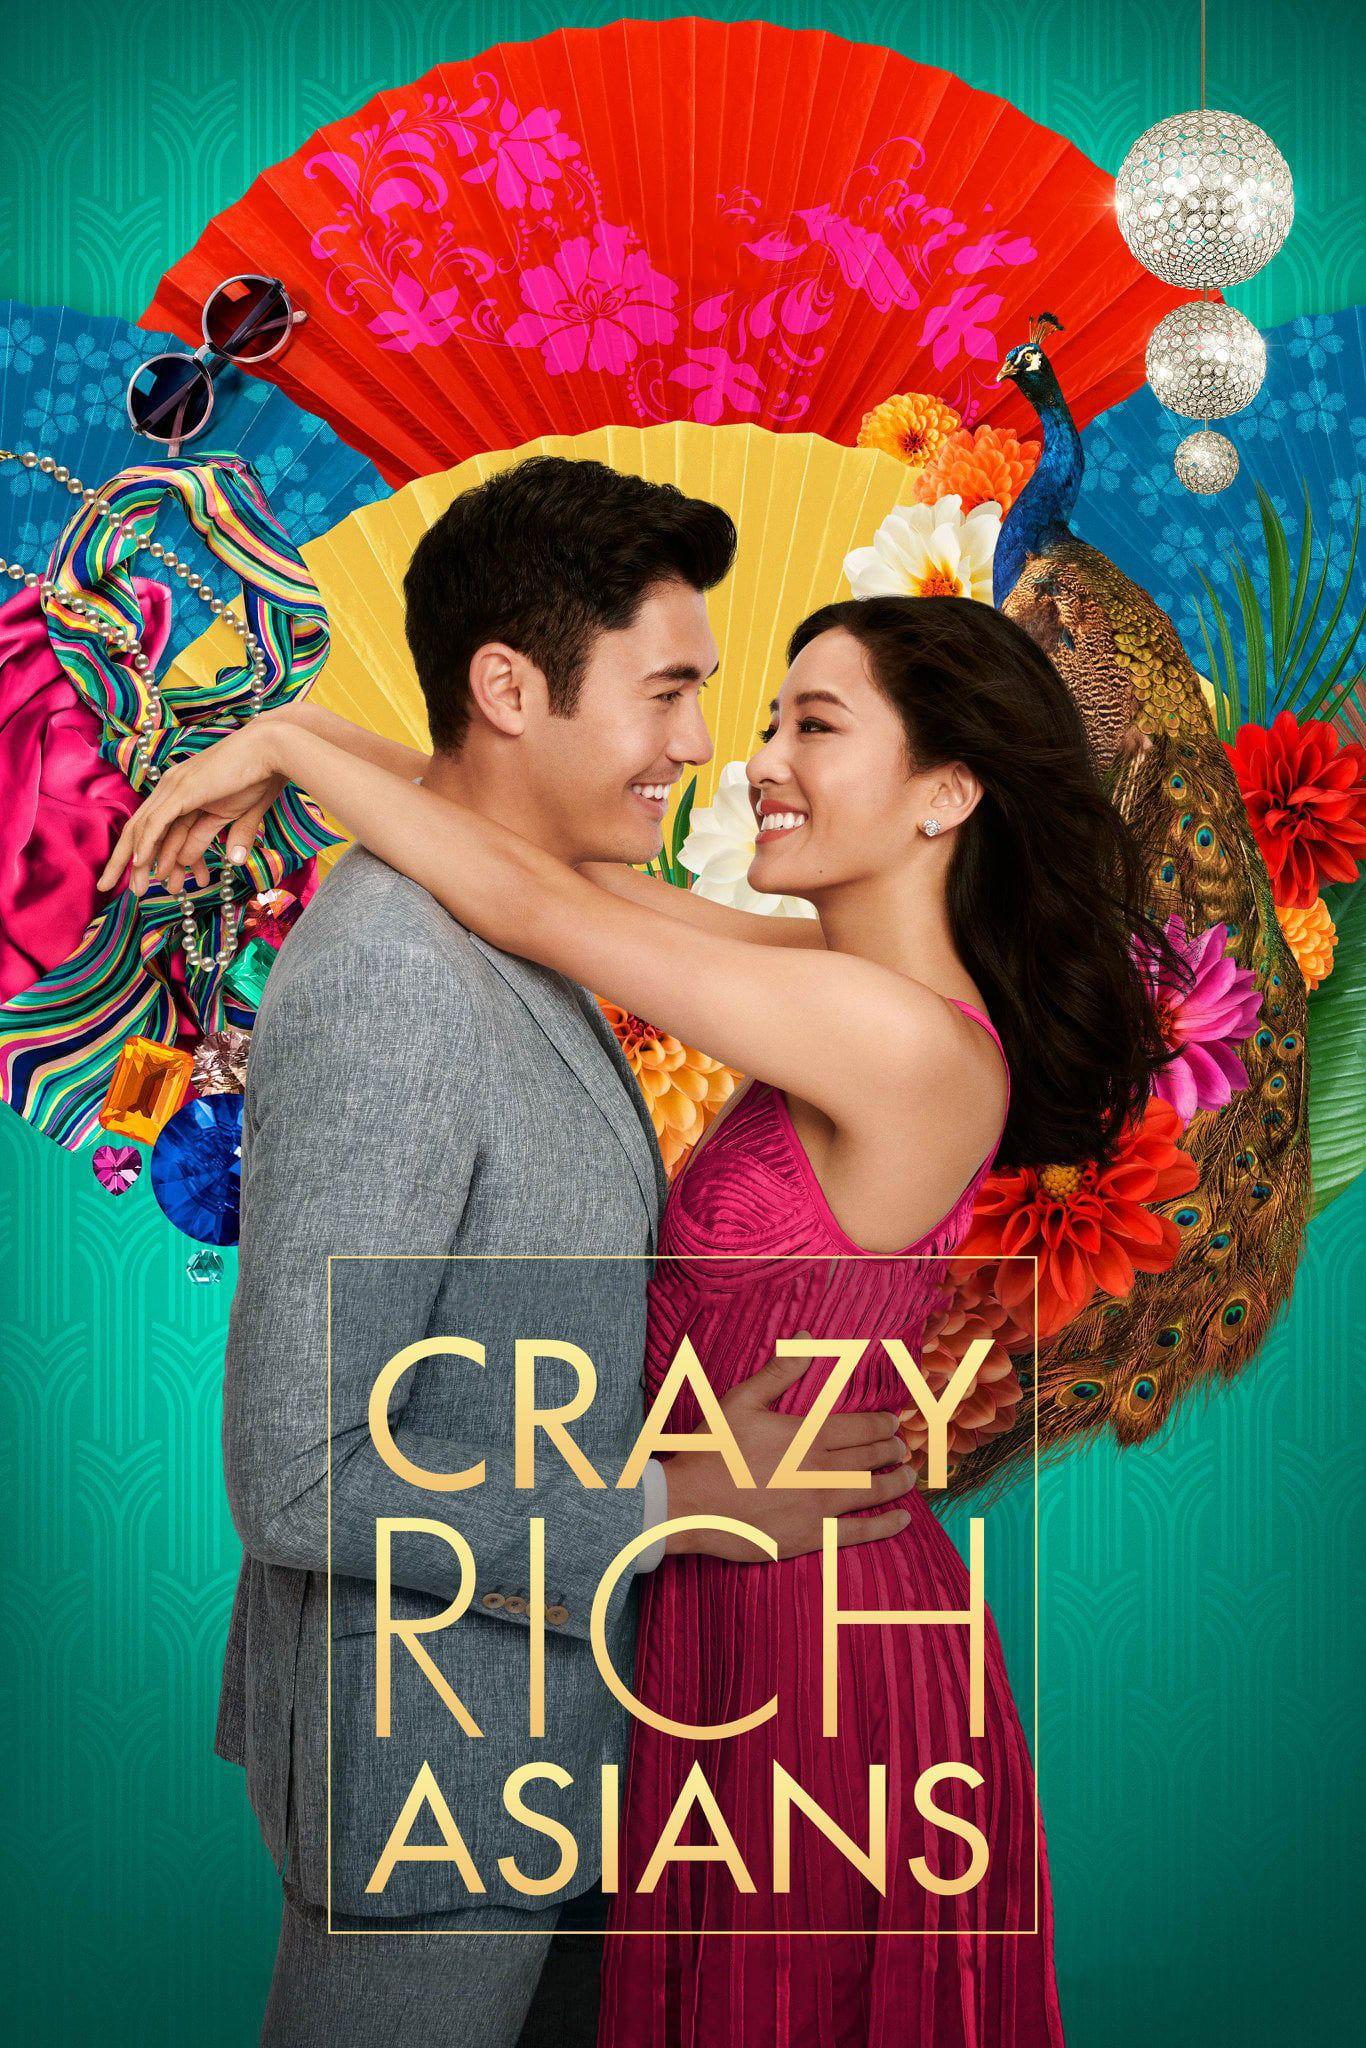 Crazy rich asians movies hdvix movies putlocker poster